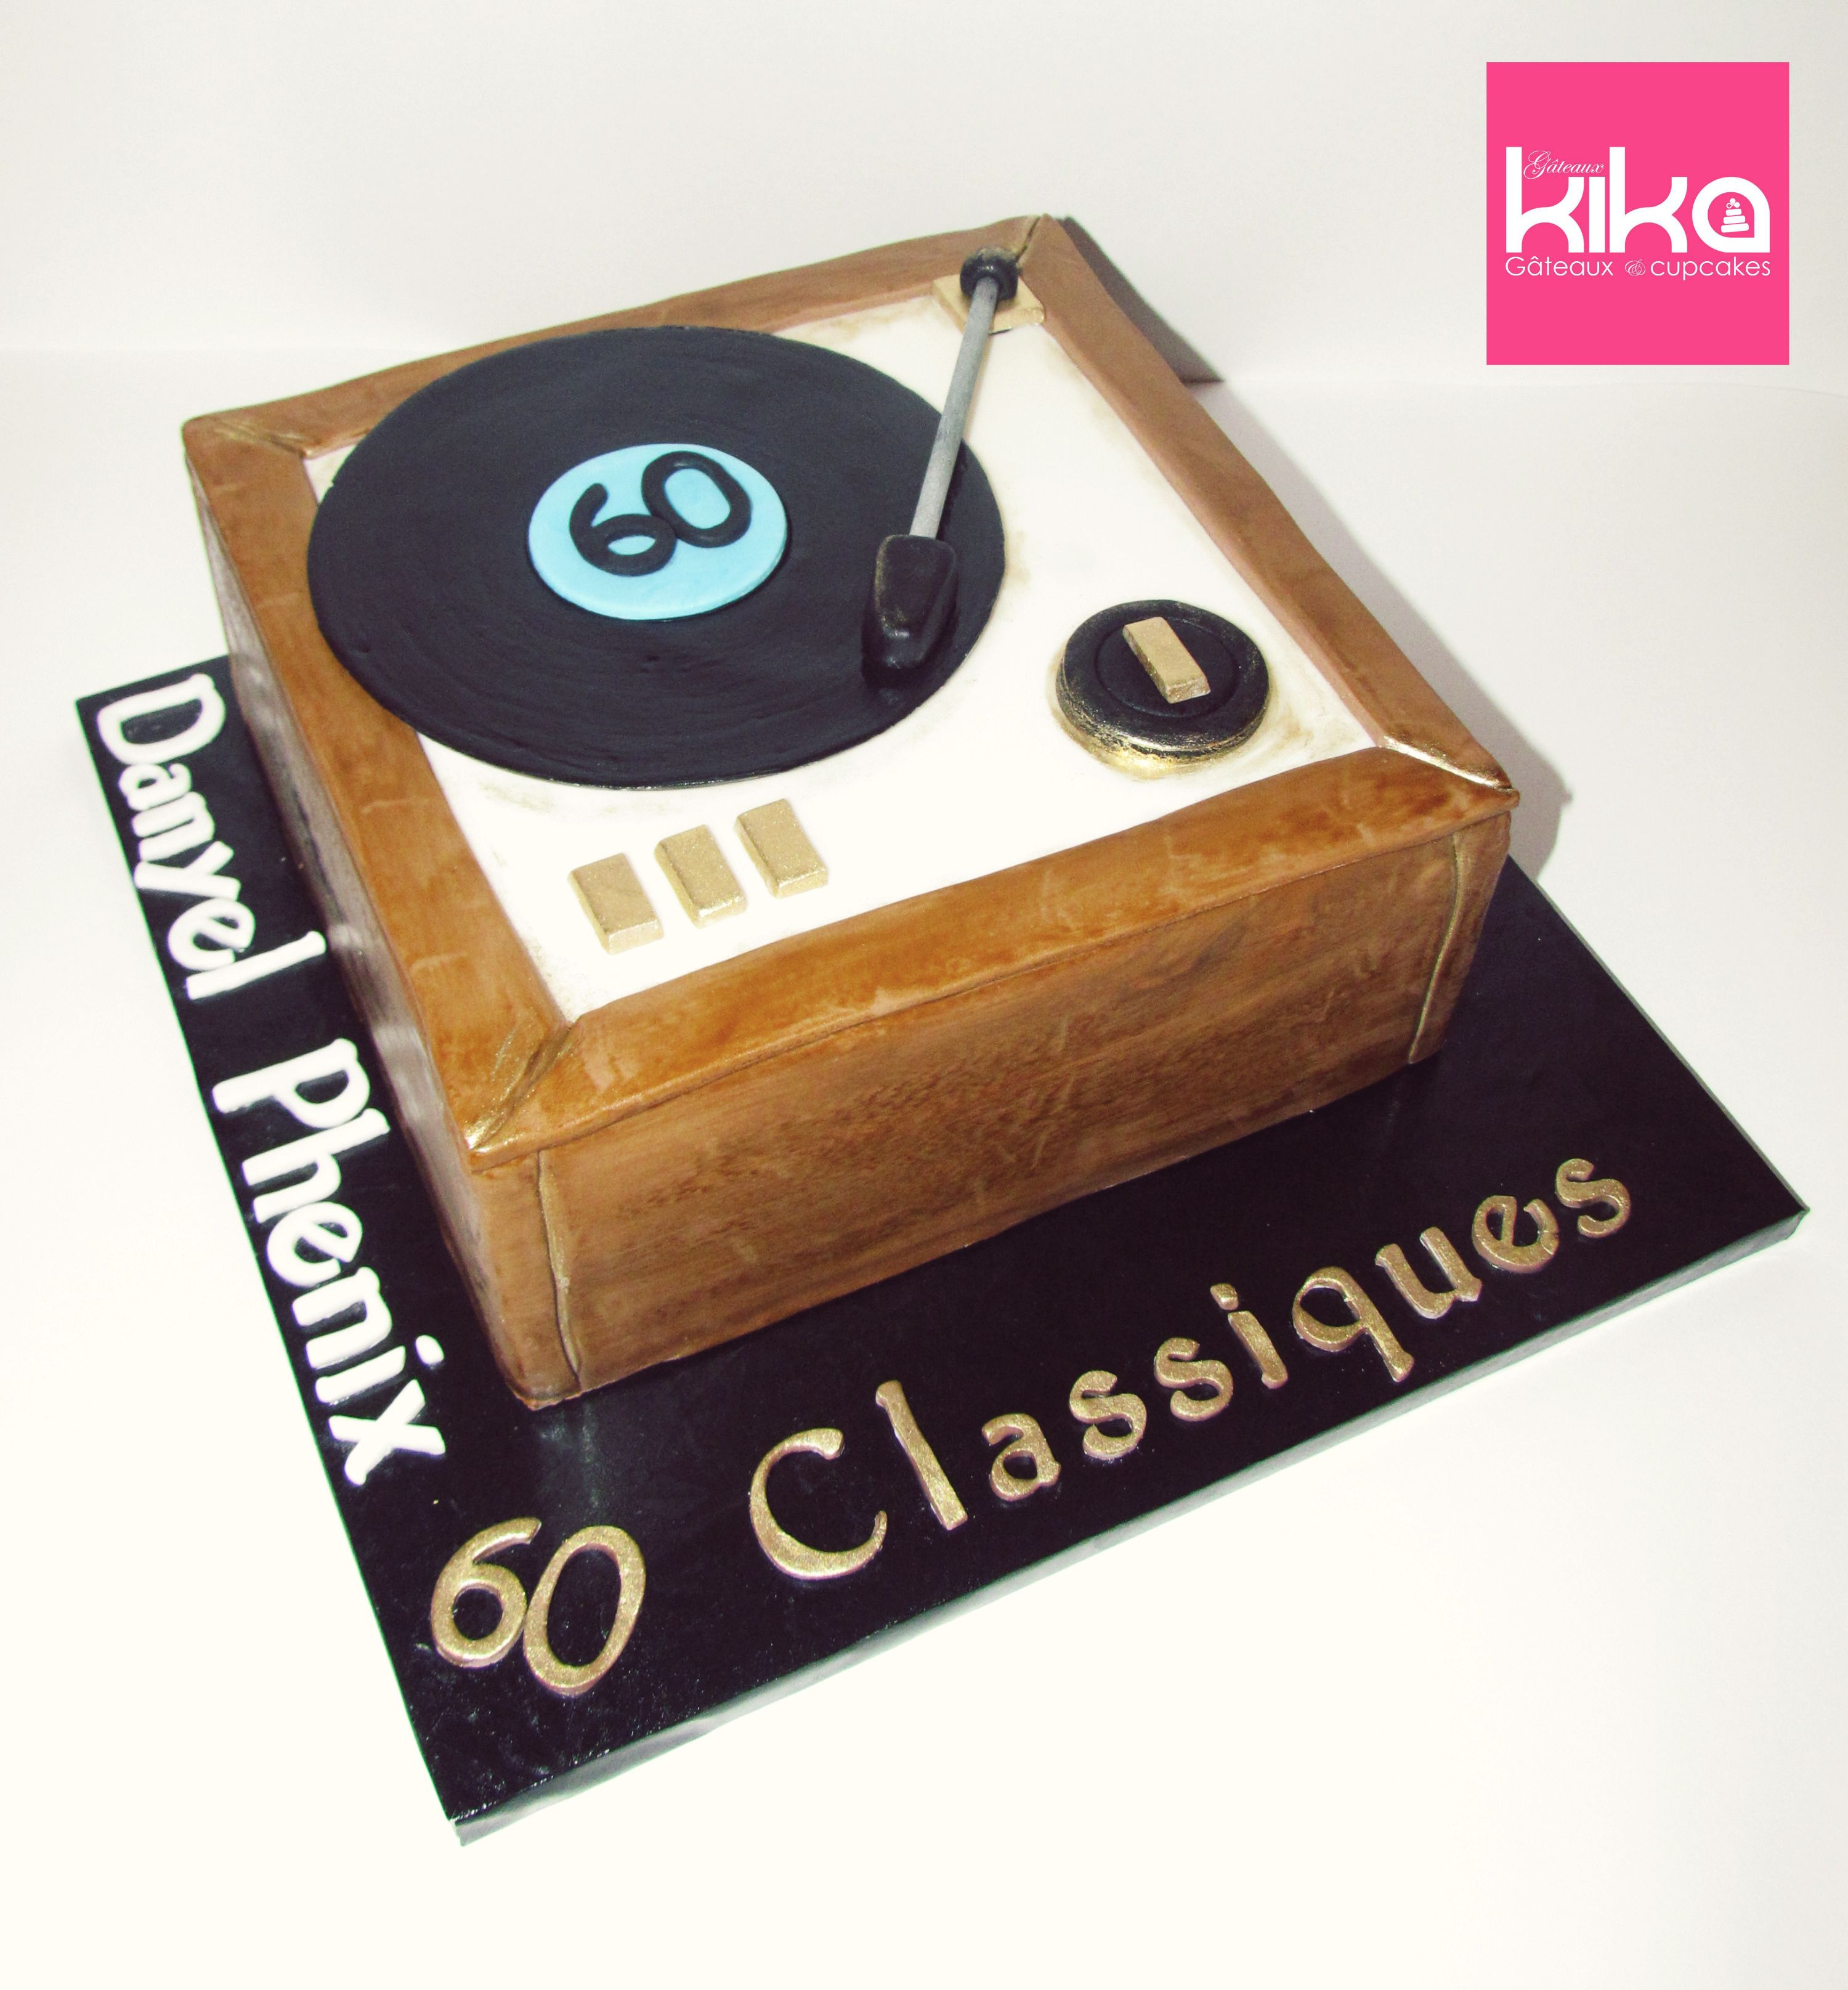 Gâteau Tourne Disque // Turntable cake #gateauxkika